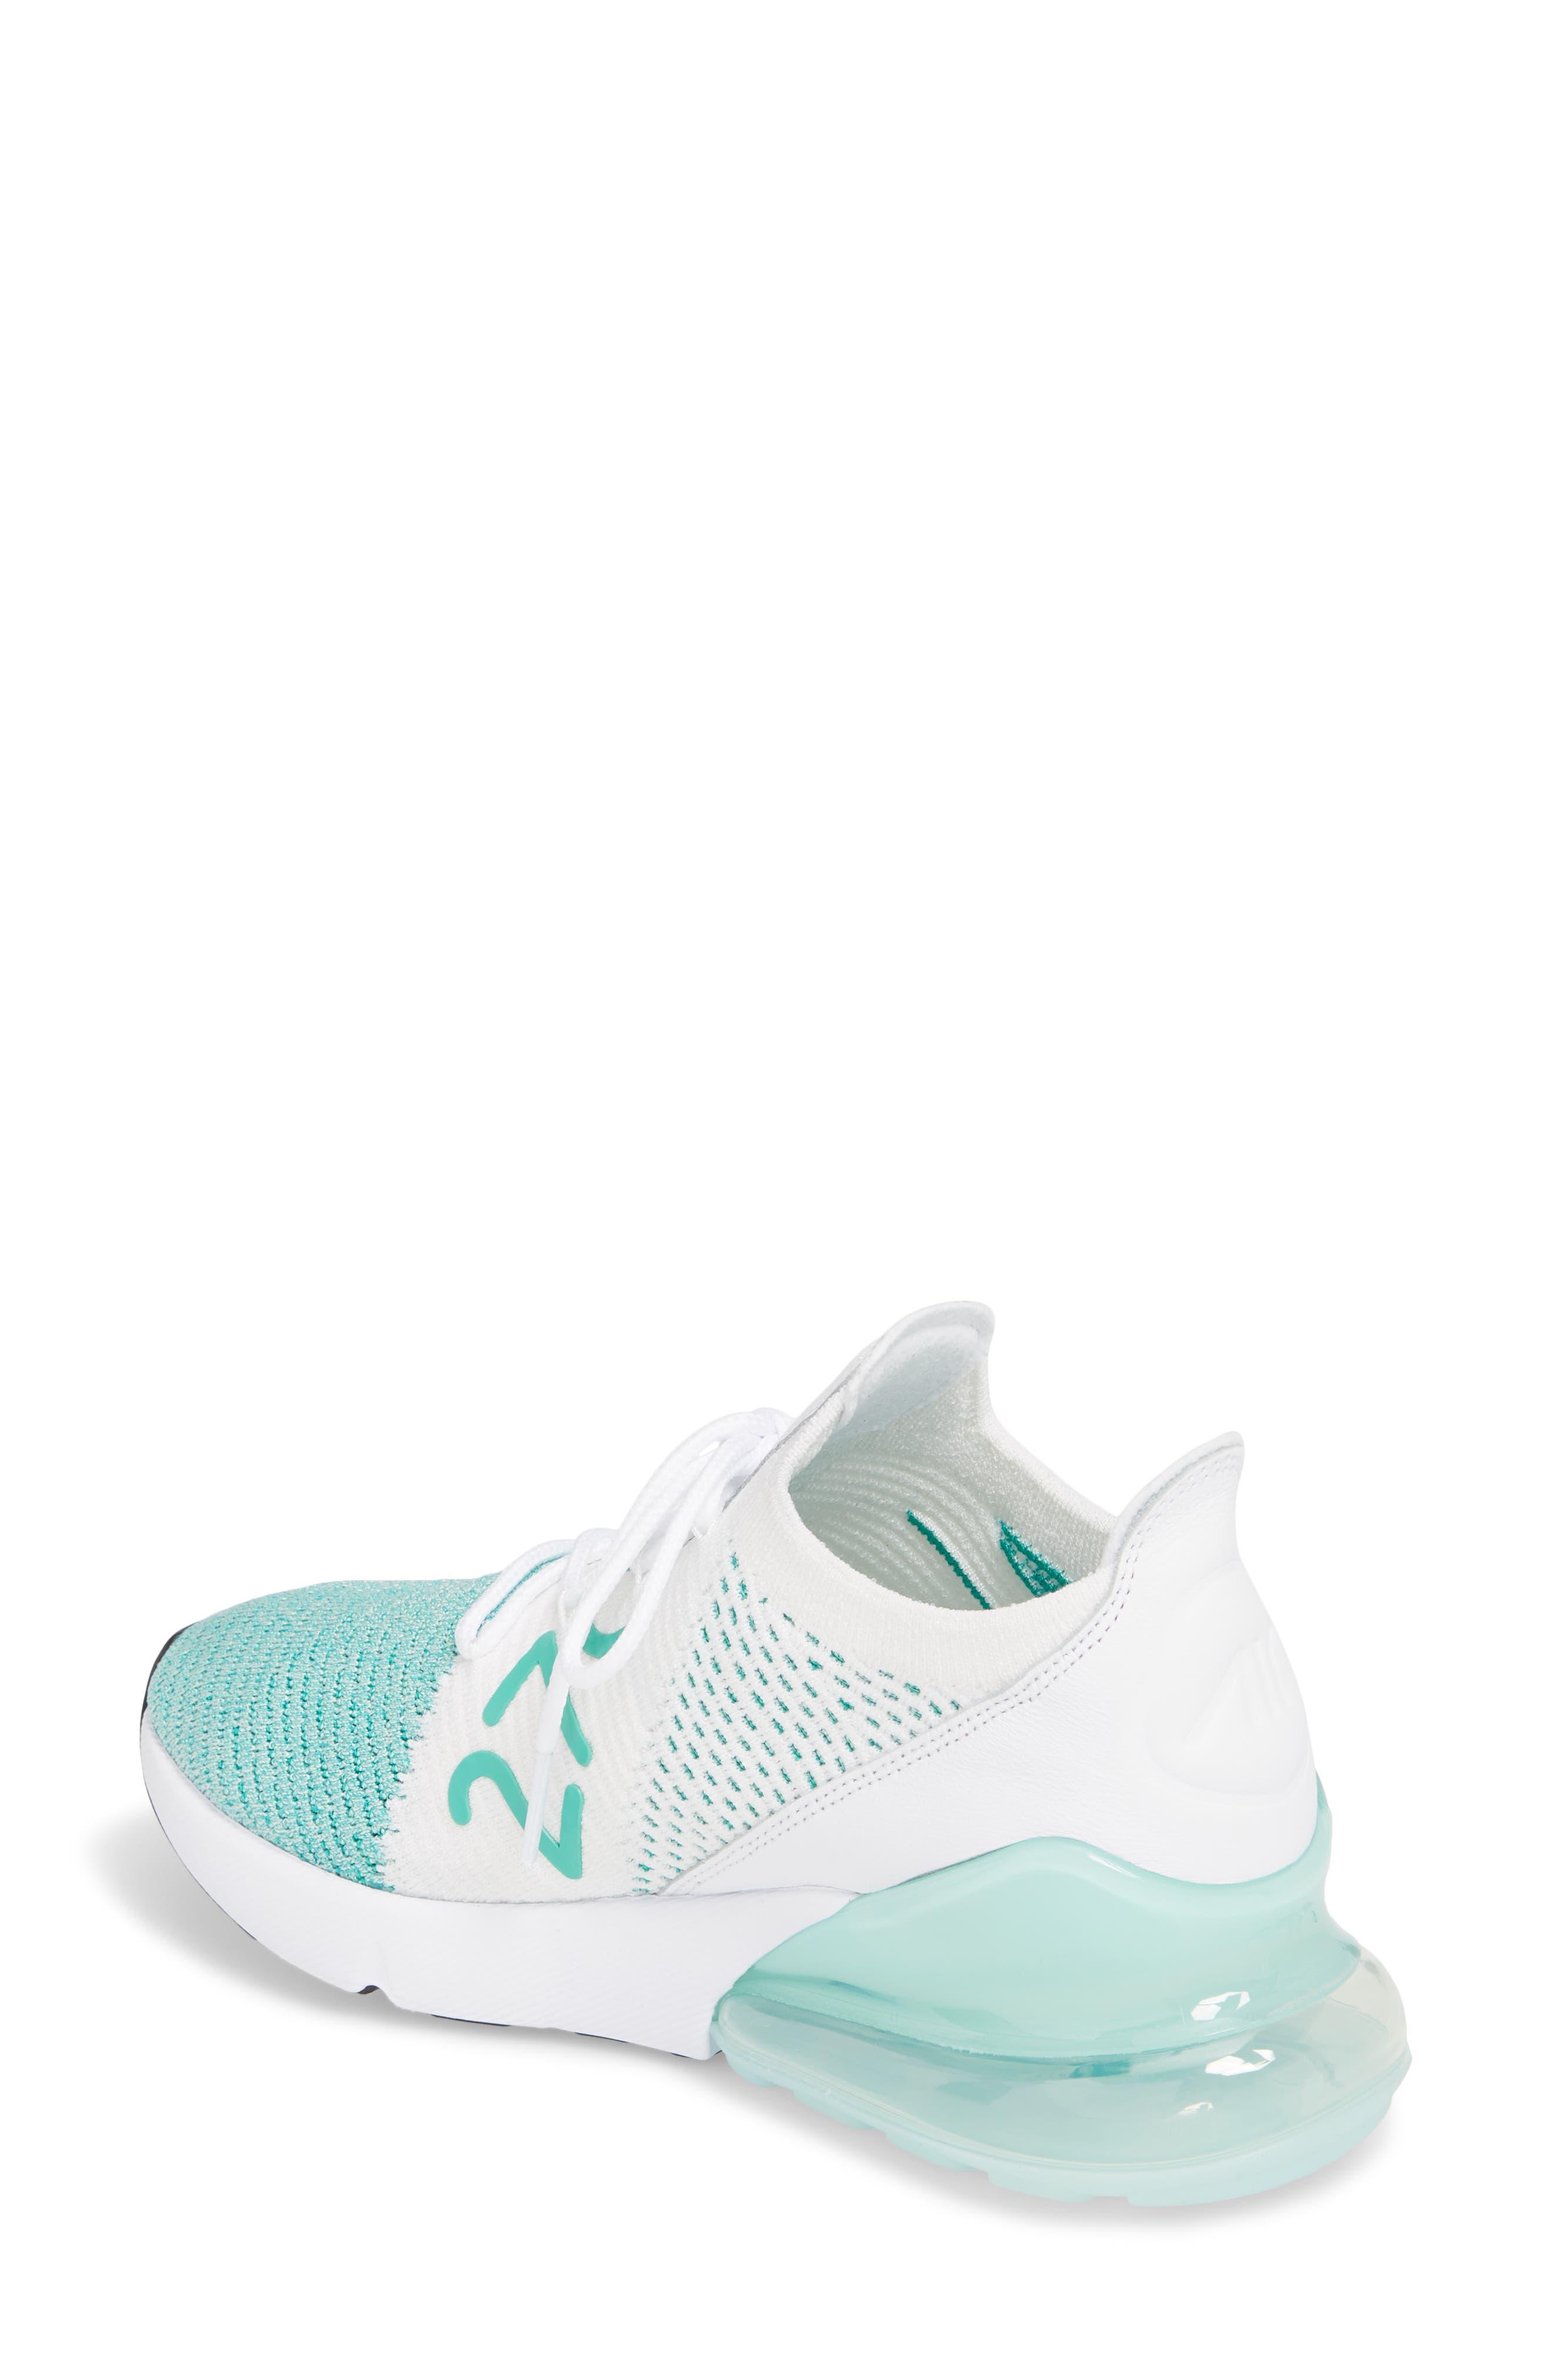 Air Max 270 Flyknit Sneaker,                             Alternate thumbnail 12, color,